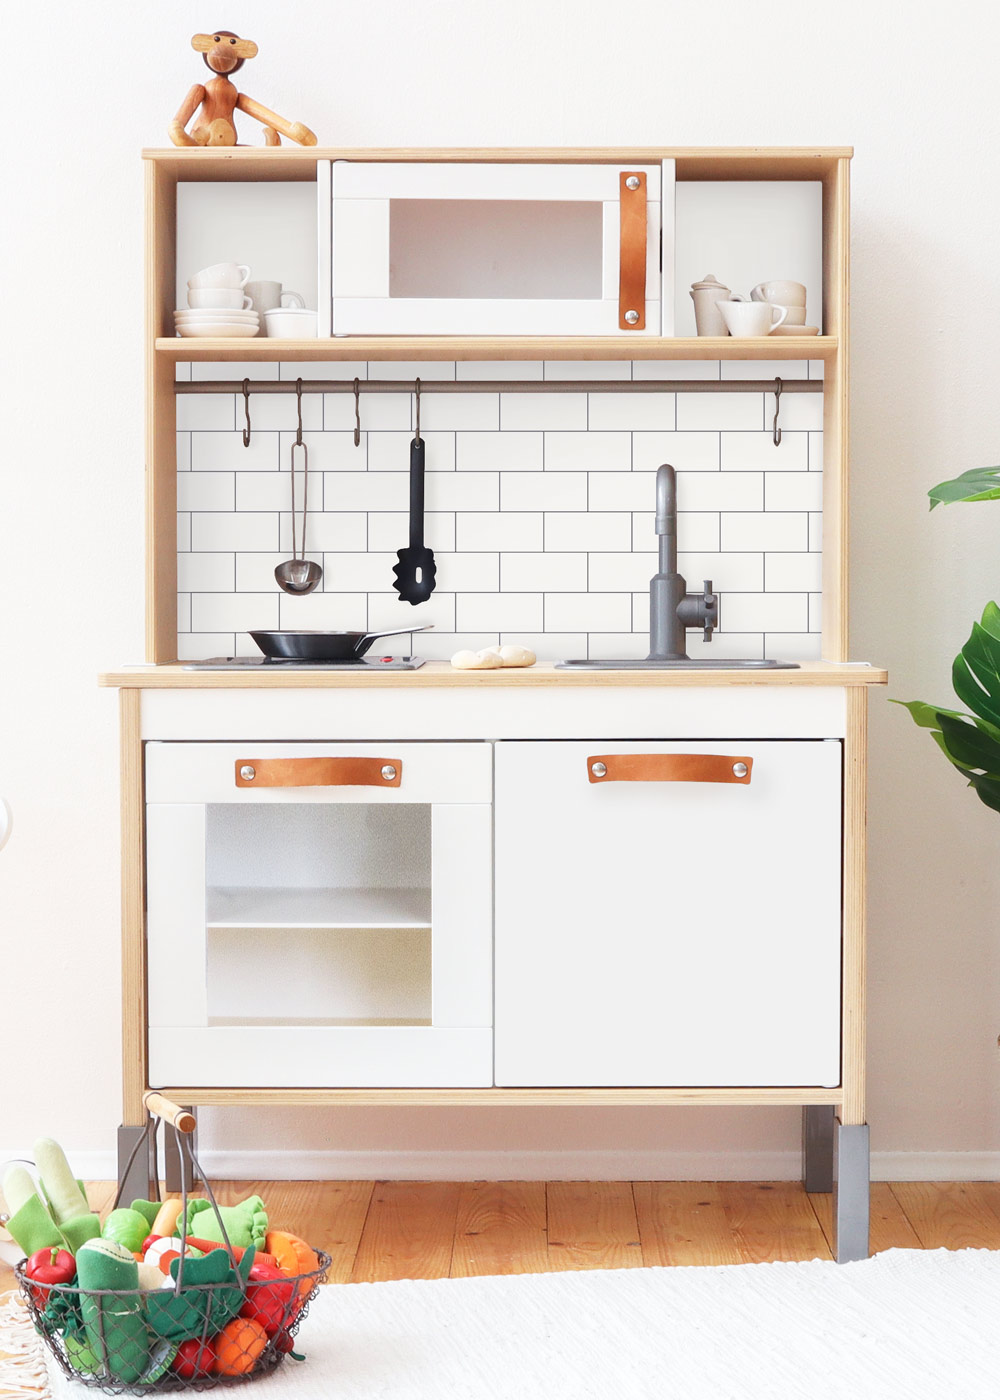 Ikea Duktig Kinderküche Kachla Metro weiss Frontansicht